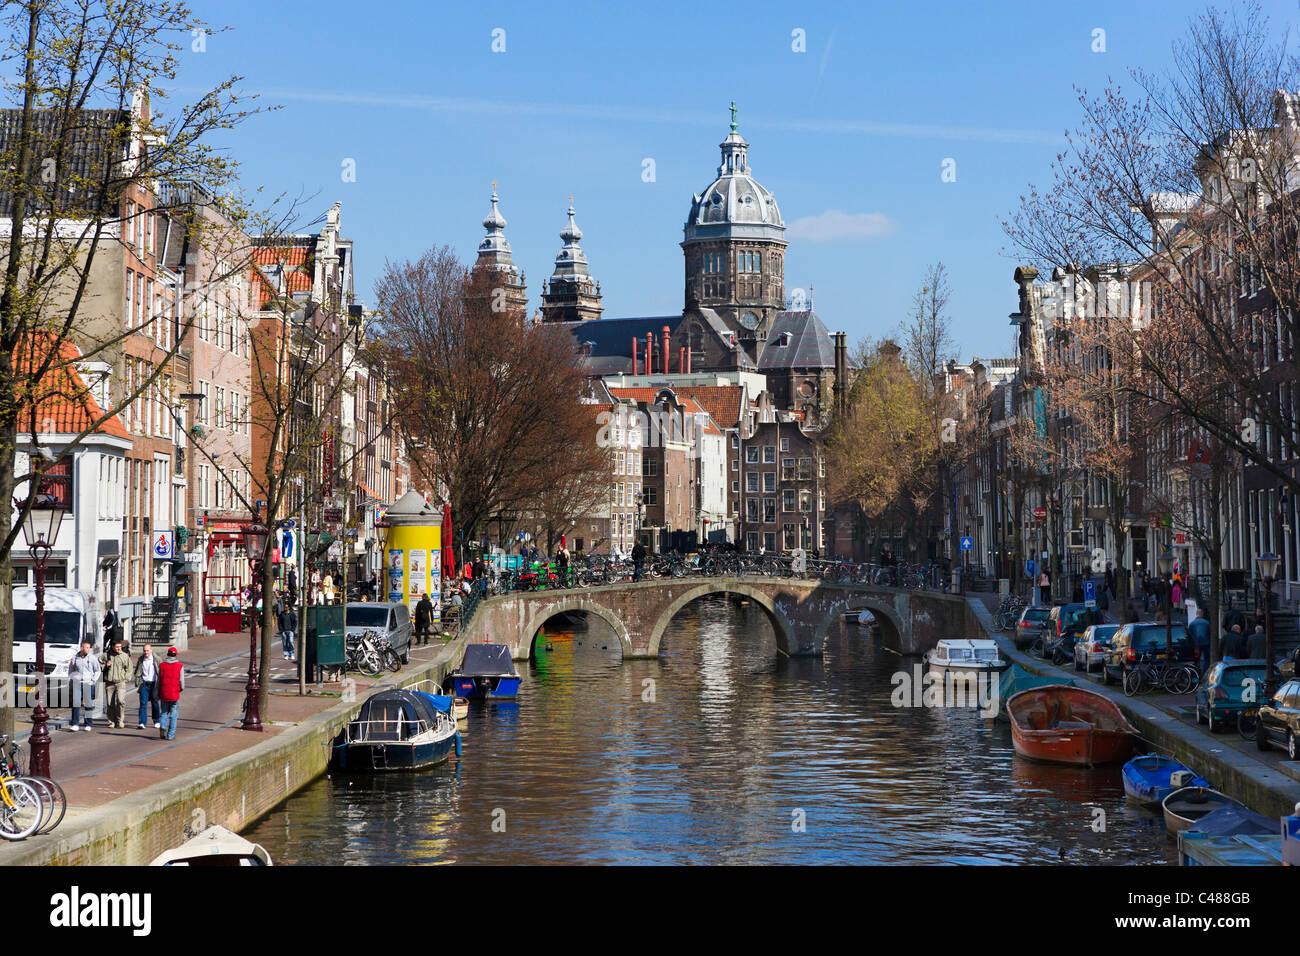 Il Sint-Nicolaaskerk (Chiesa di San Nicola) alla fine del Oudezijds Voorburgwal, Amsterdam, Paesi Bassi Immagini Stock